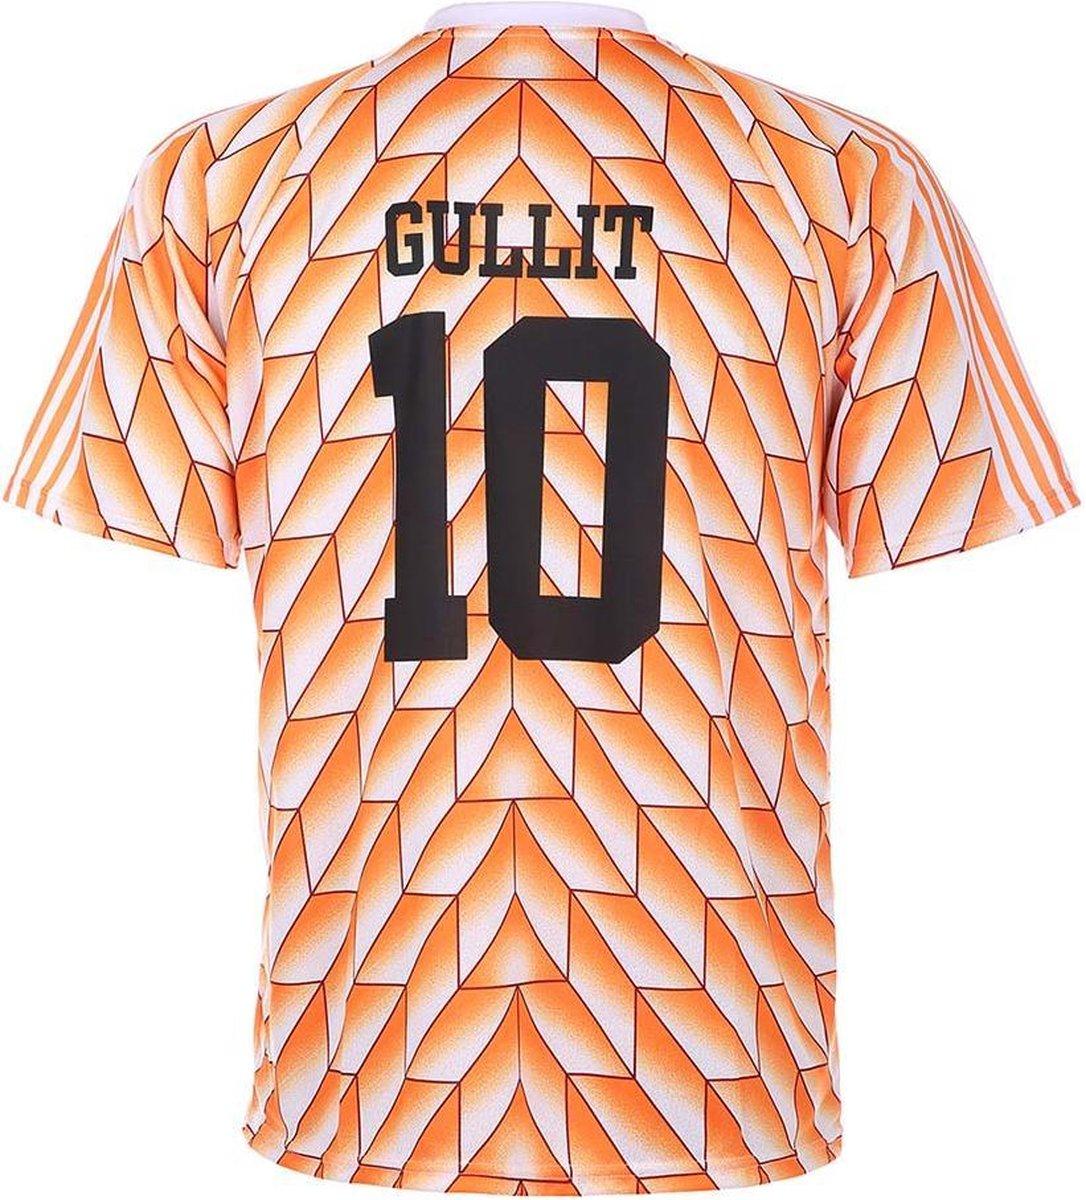 EK 88 Voetbalshirt Gullit 1988 - Oranje - Kids - Senior-L